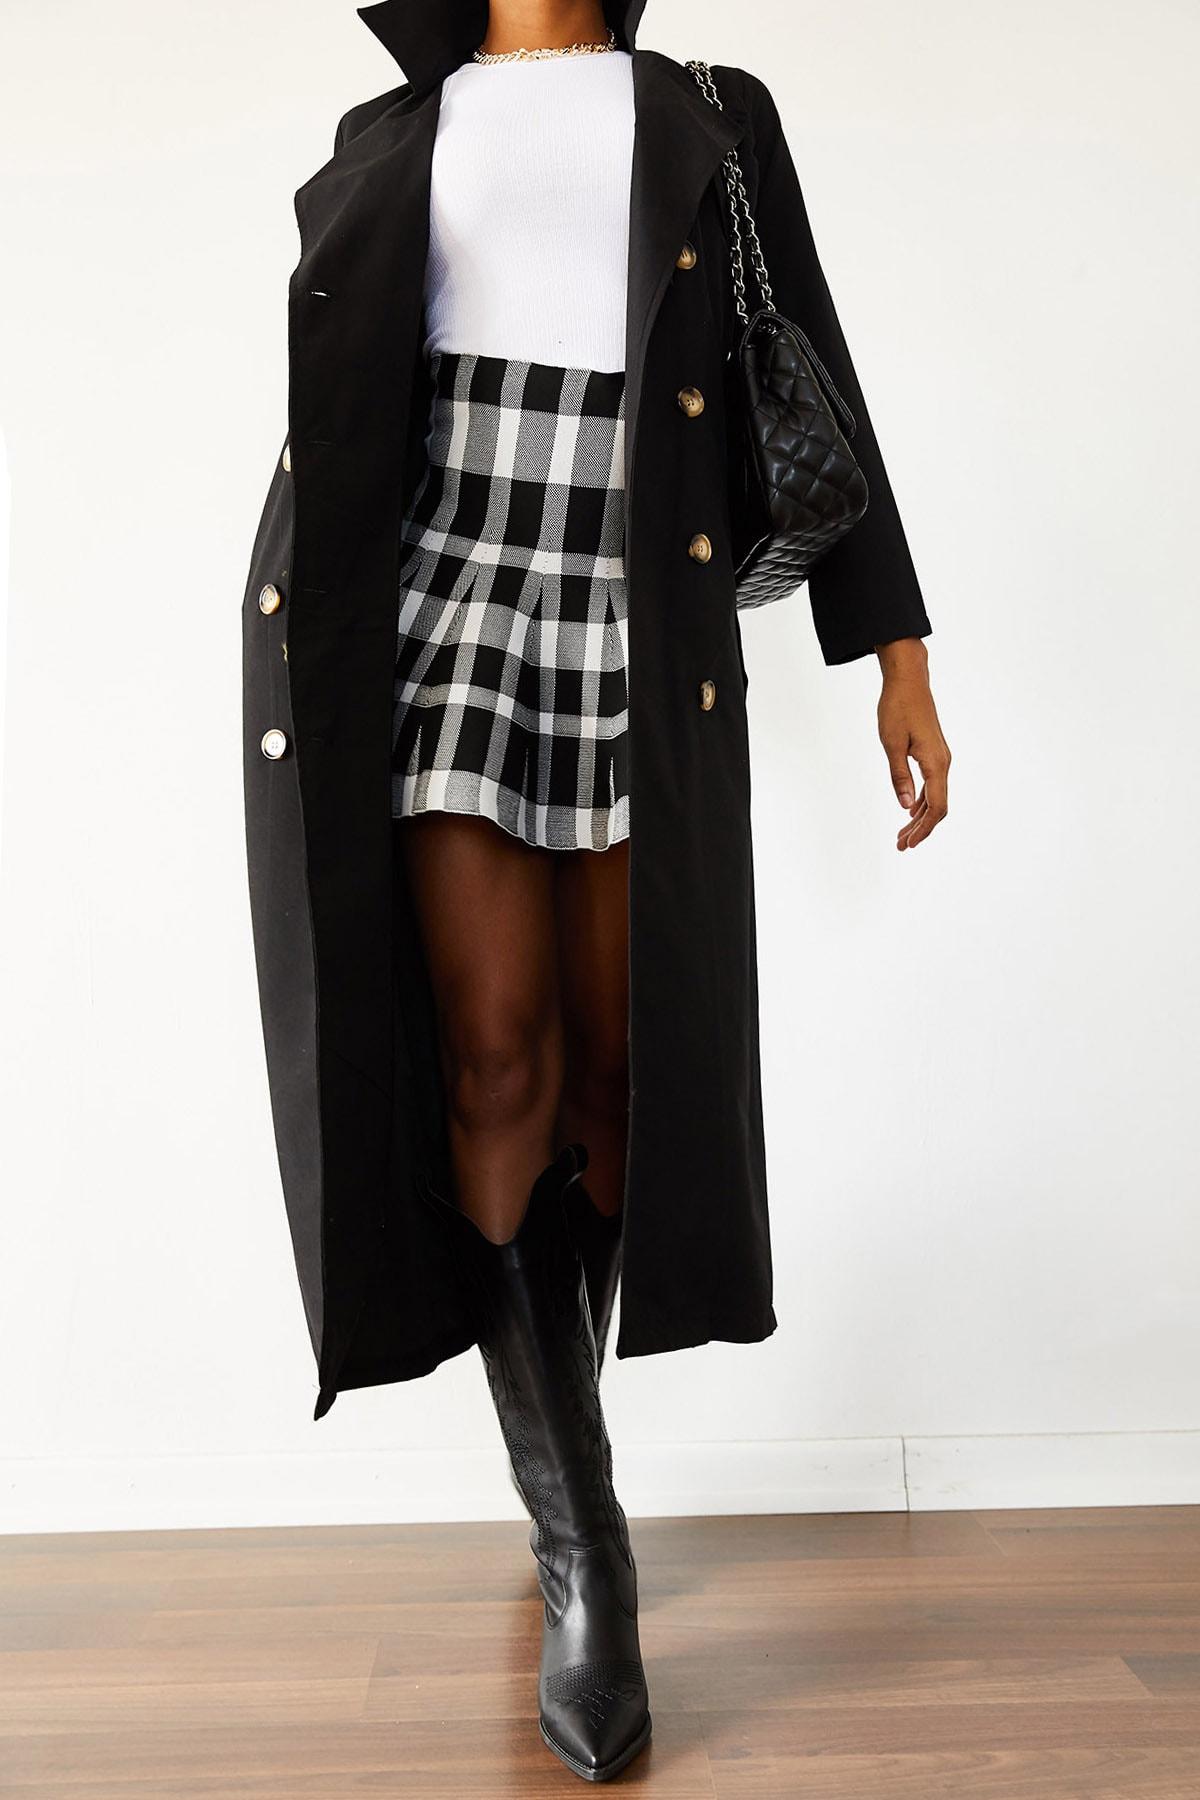 XENA Kadın Siyah Şal Yaka Düğmeli Trençkot 1KZK4-10759-02 2